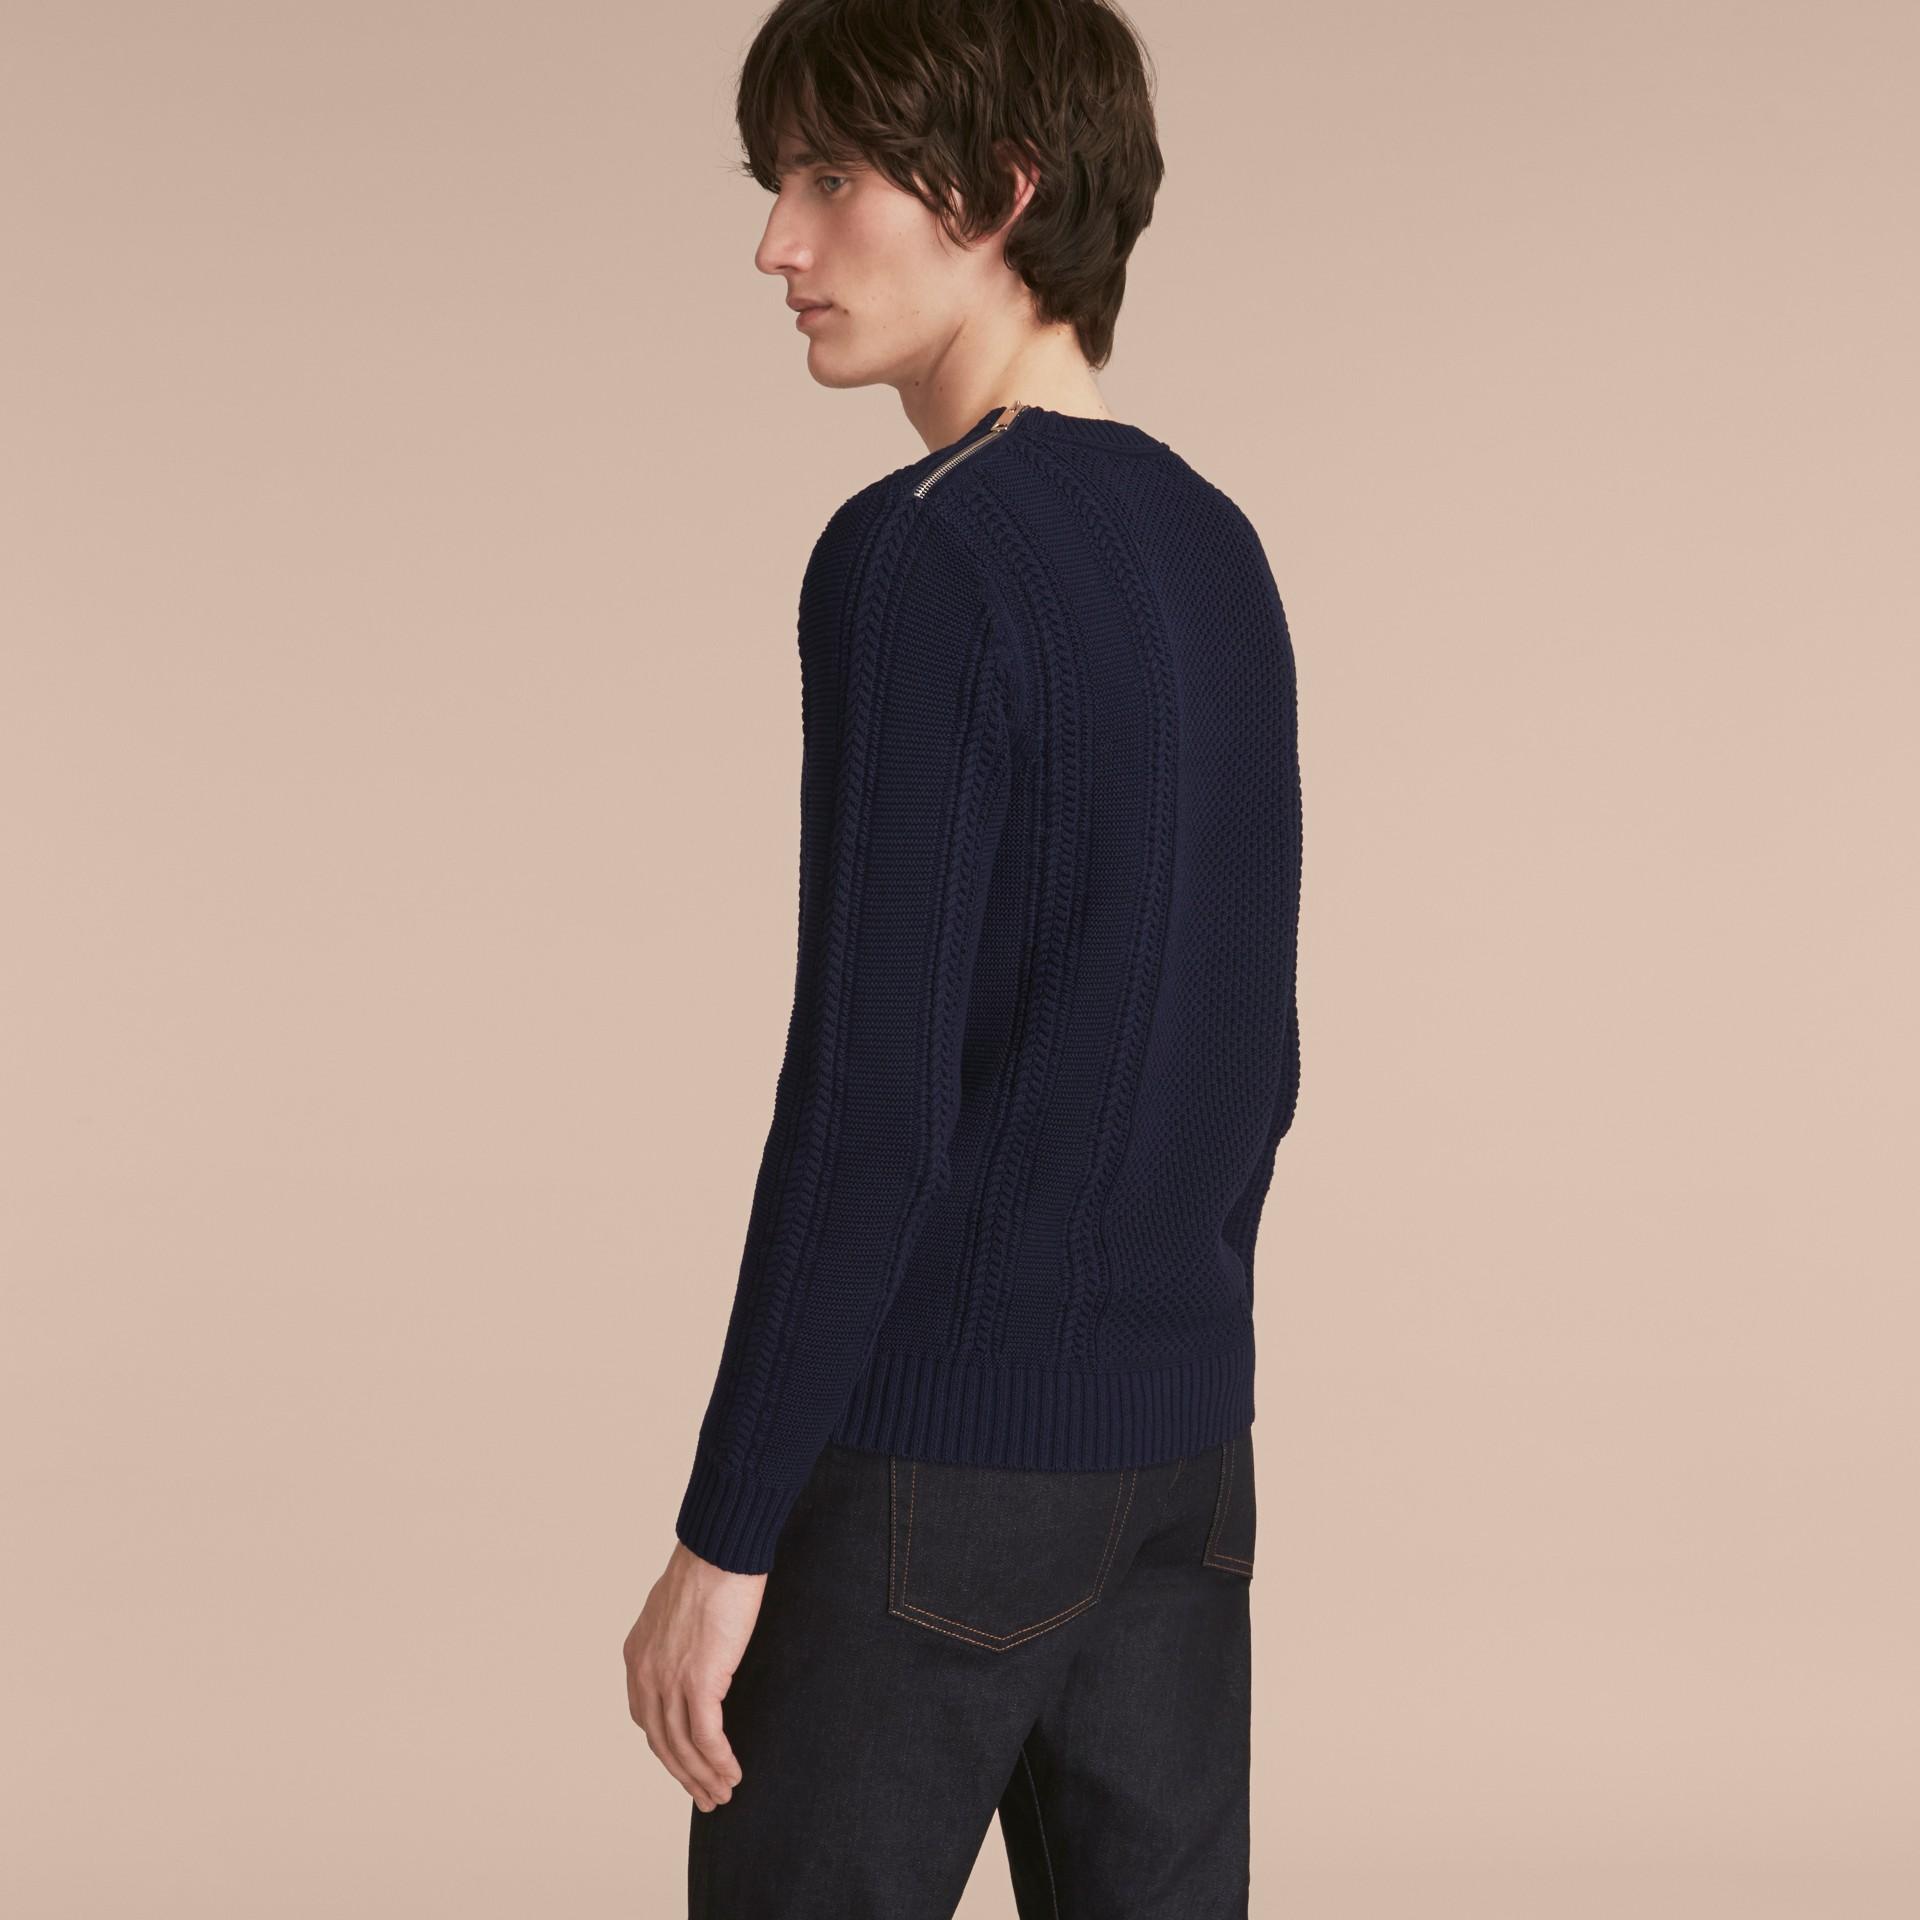 Zip Detail Aran Knit Cotton Sweater - gallery image 3